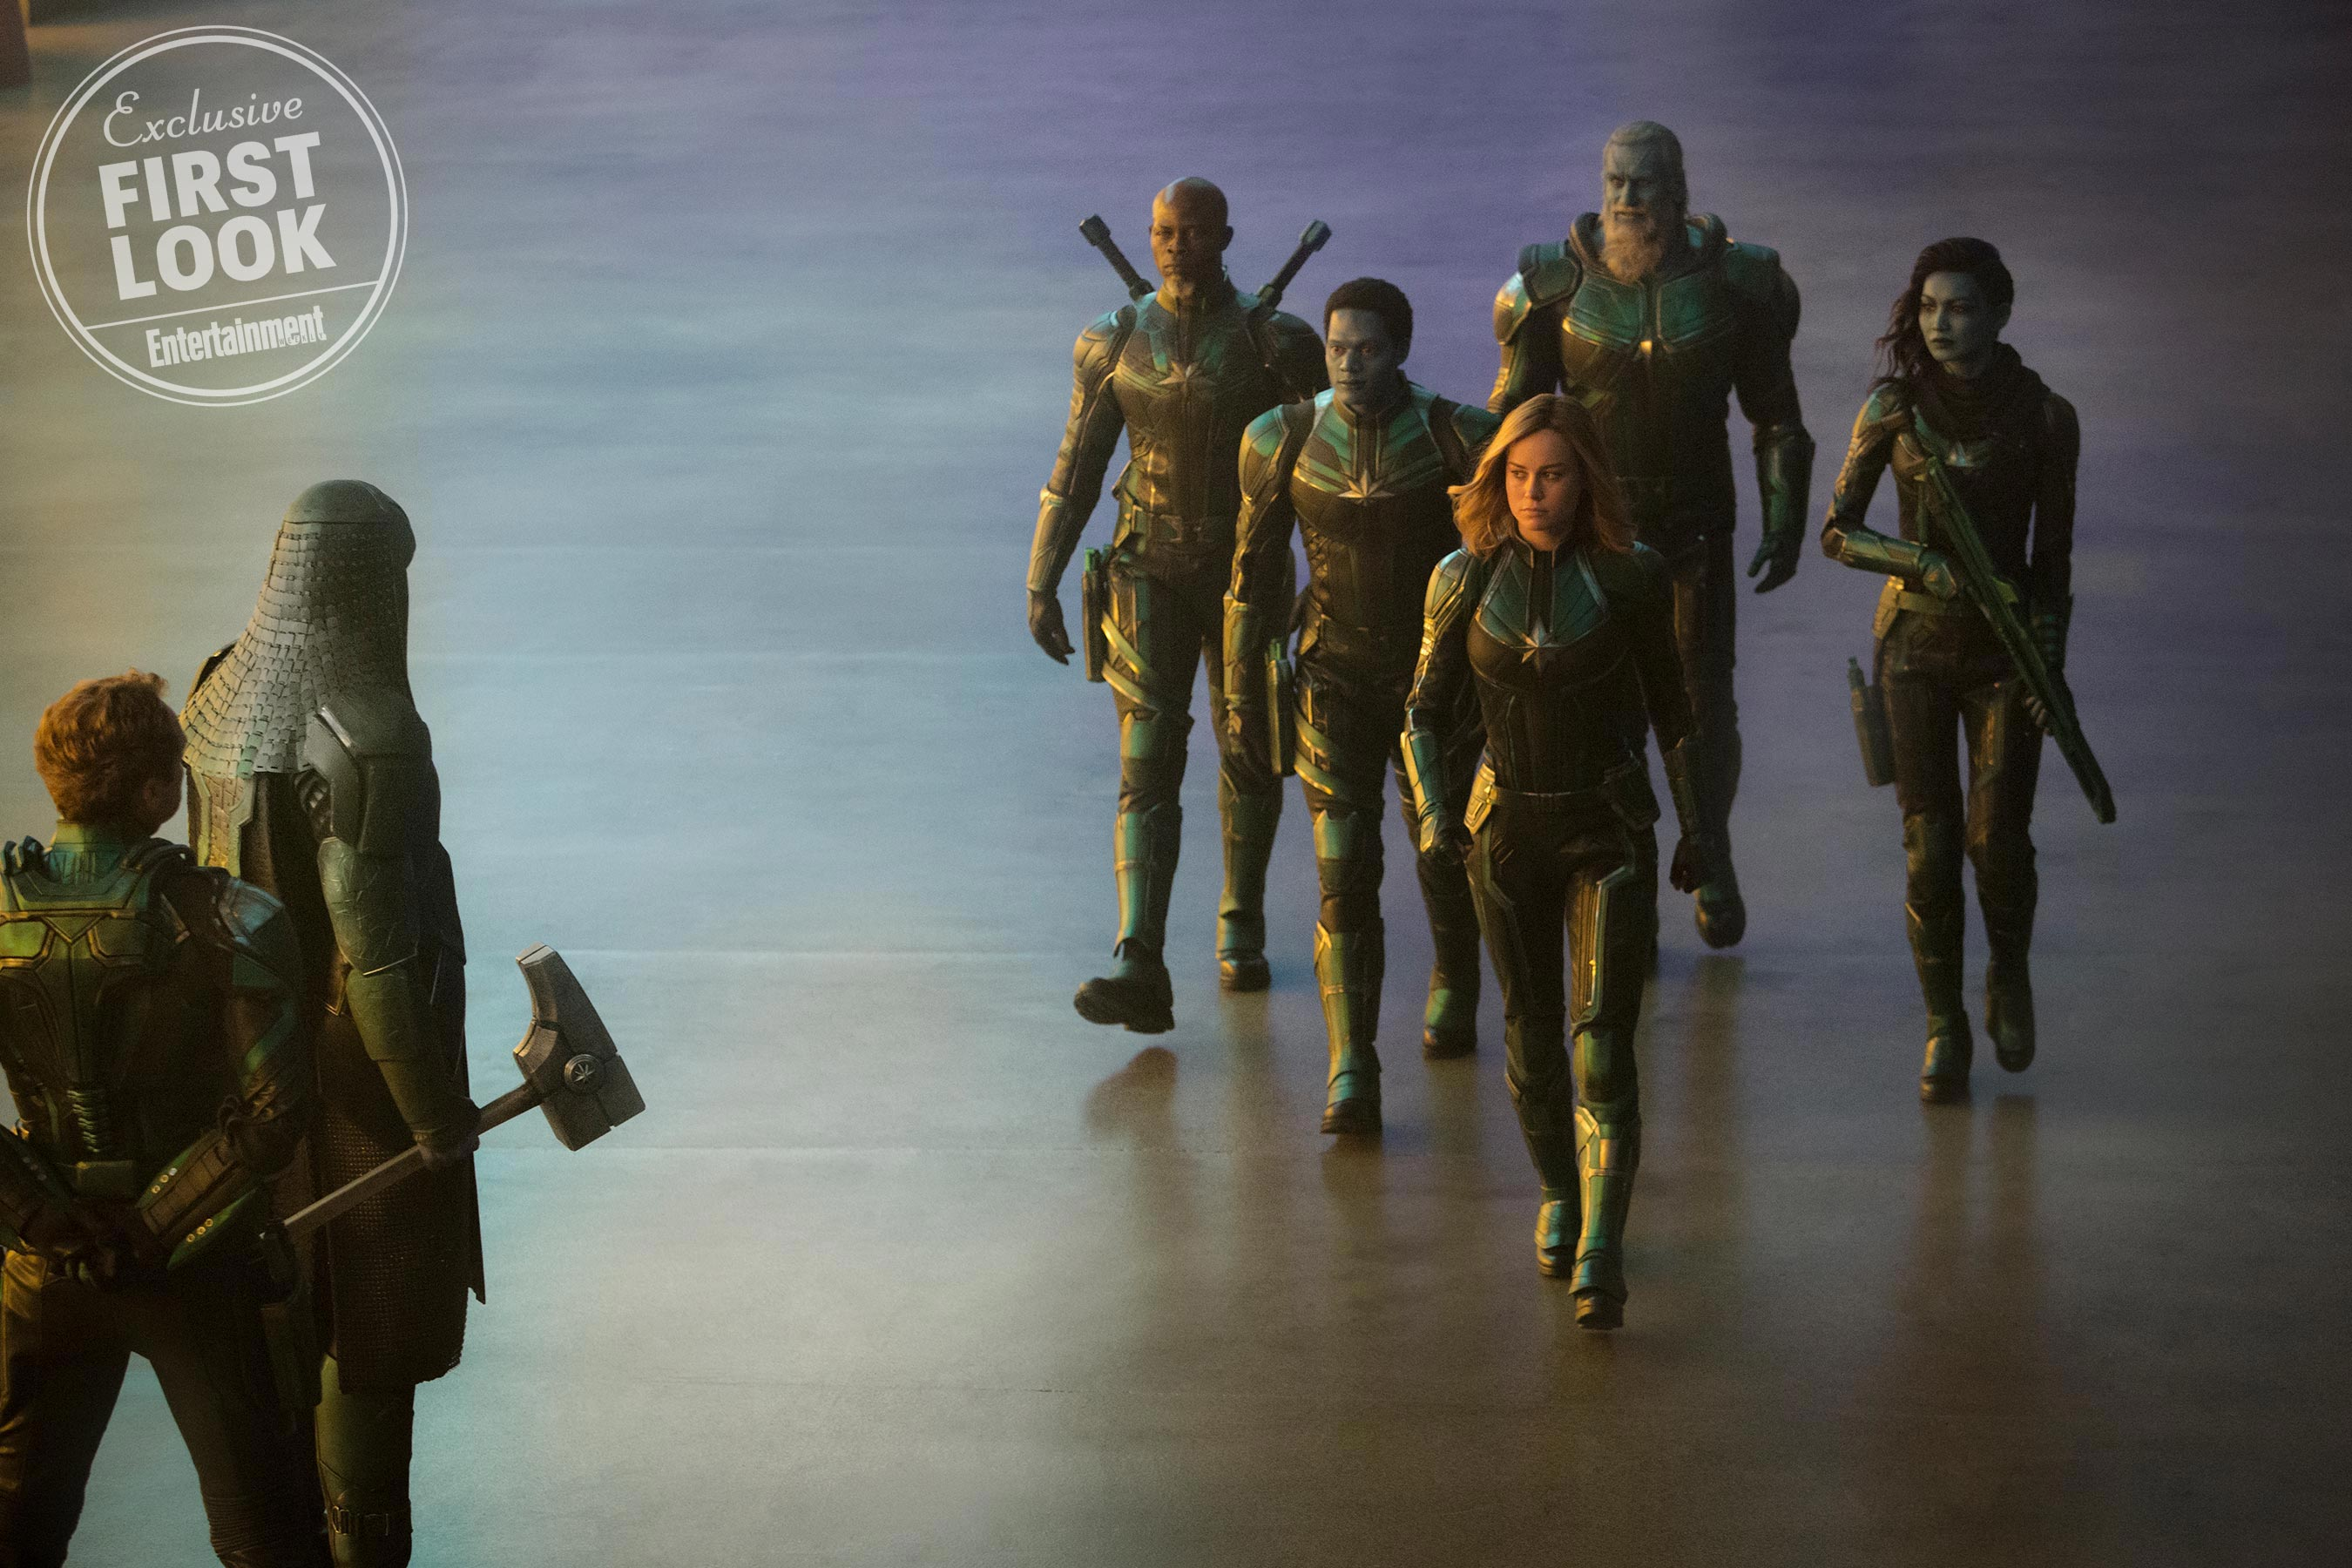 Captain Marvel Starforce (Jude Law), Ronan (Lee Pace), Korath (Djimon Hounsou), Att-Lass (Algenis Perez Soto), Carol Danvers/Captain Marvel (Brie Larson), Bron-Char (Rune Temte) and Minn-Erva (Gemma Chan)